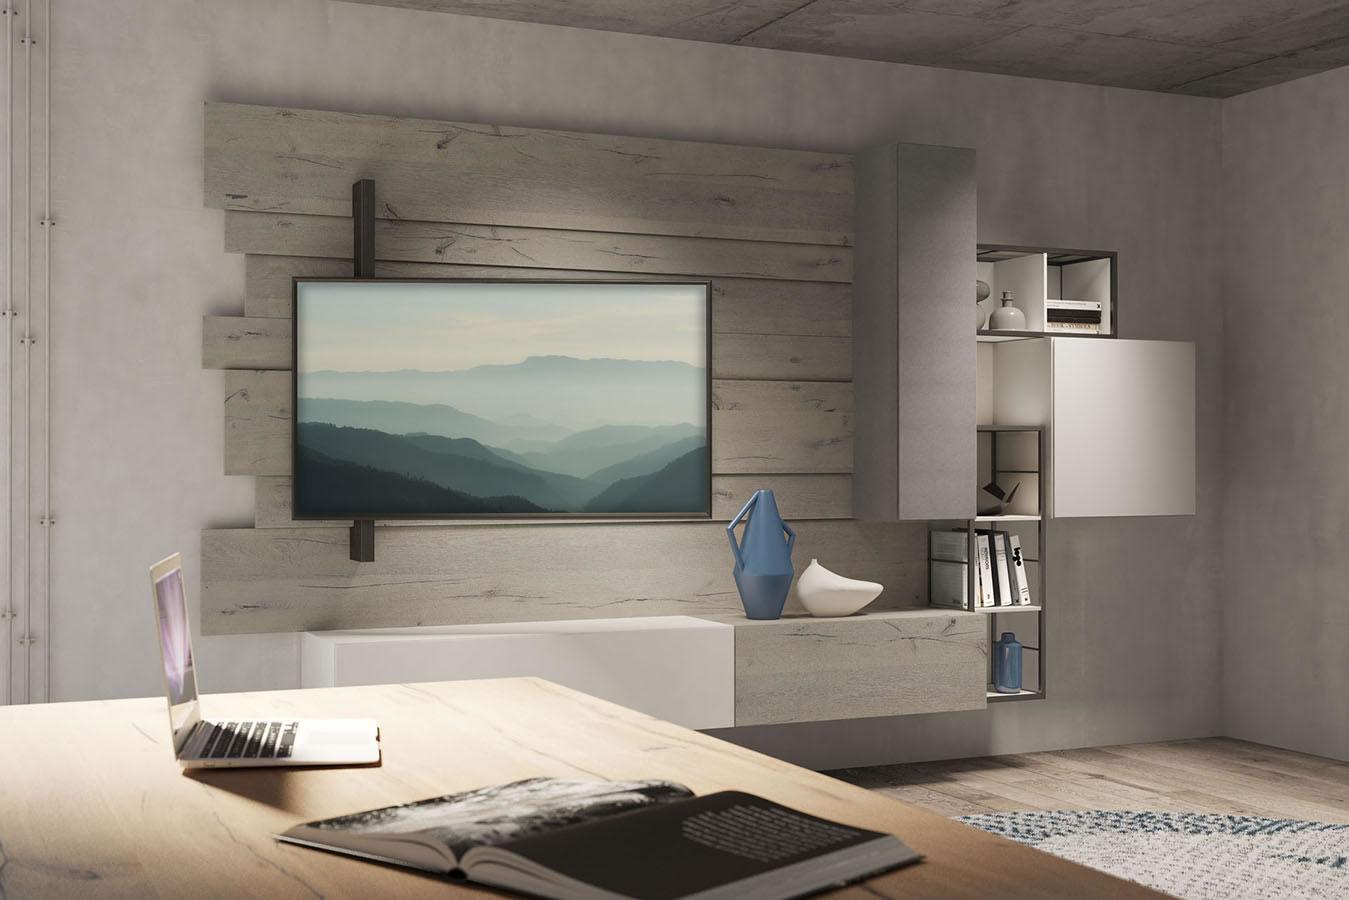 Latest Italian Sofa Designs Knislinge Leather Review Momentoitalia Furniture Blog News From The 2016